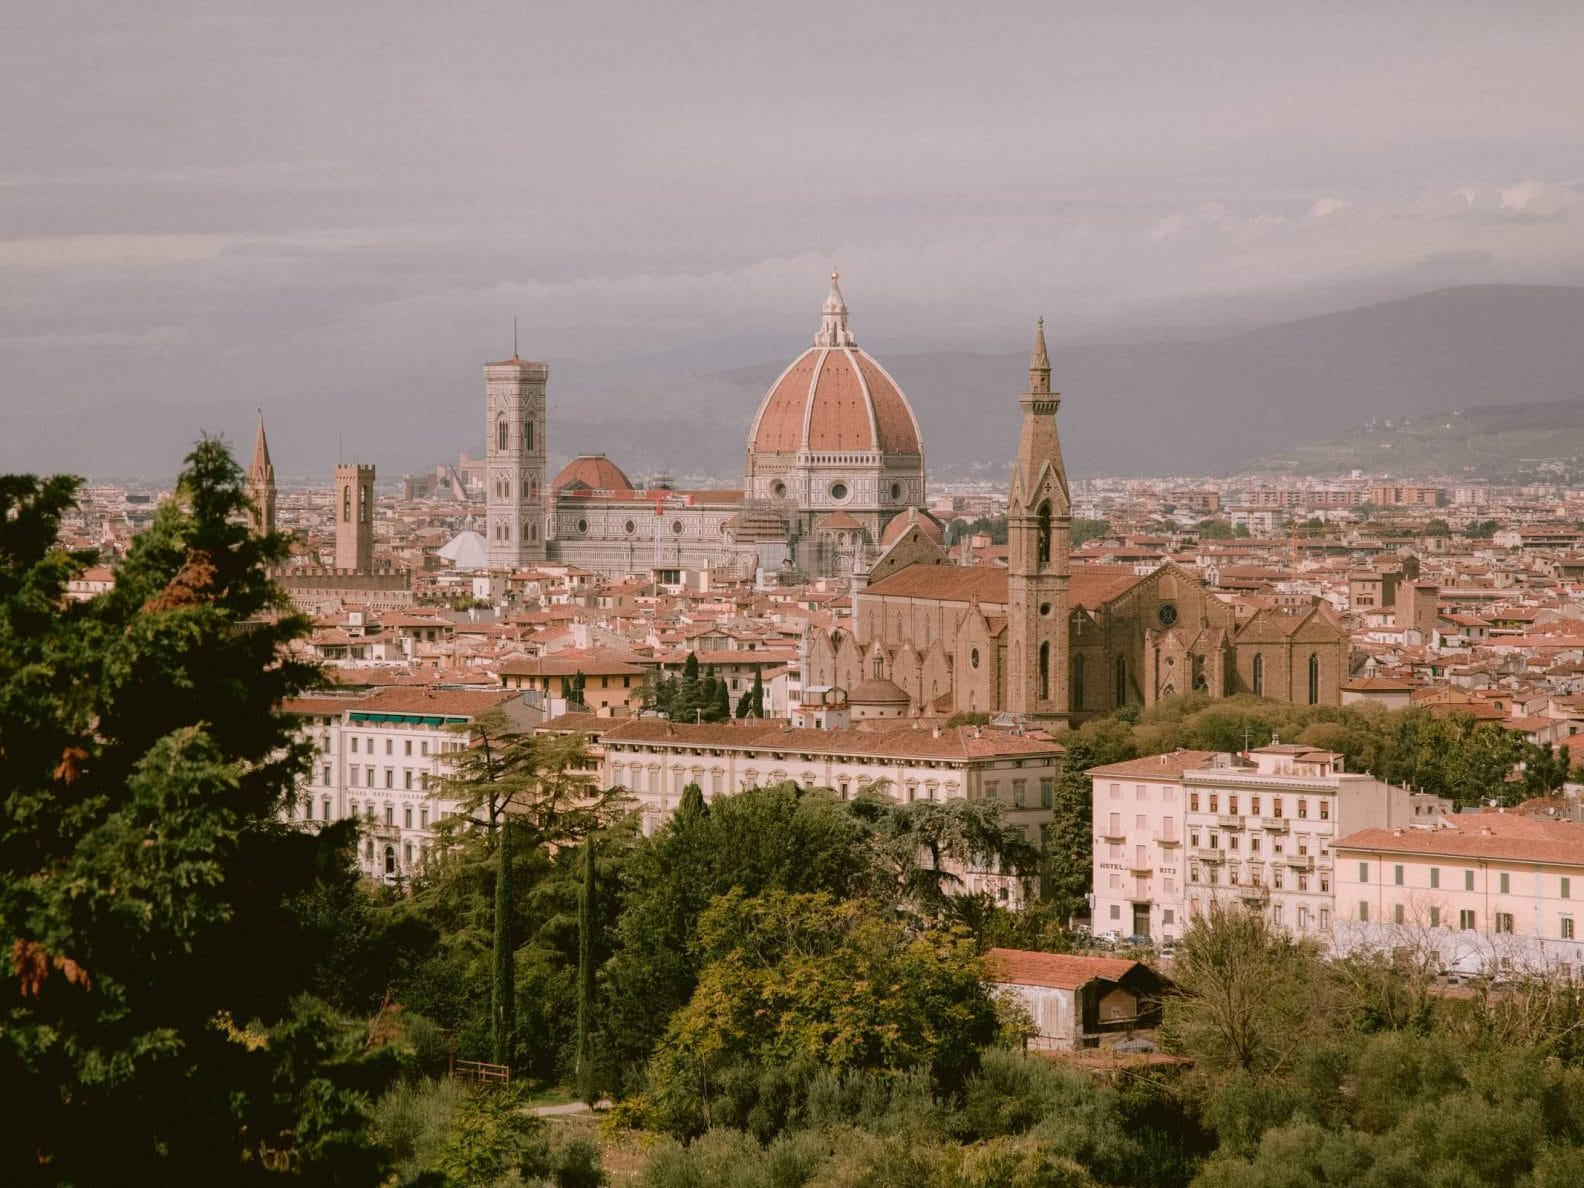 The Duomo of Florence from the Villa la Vedetta's terrace